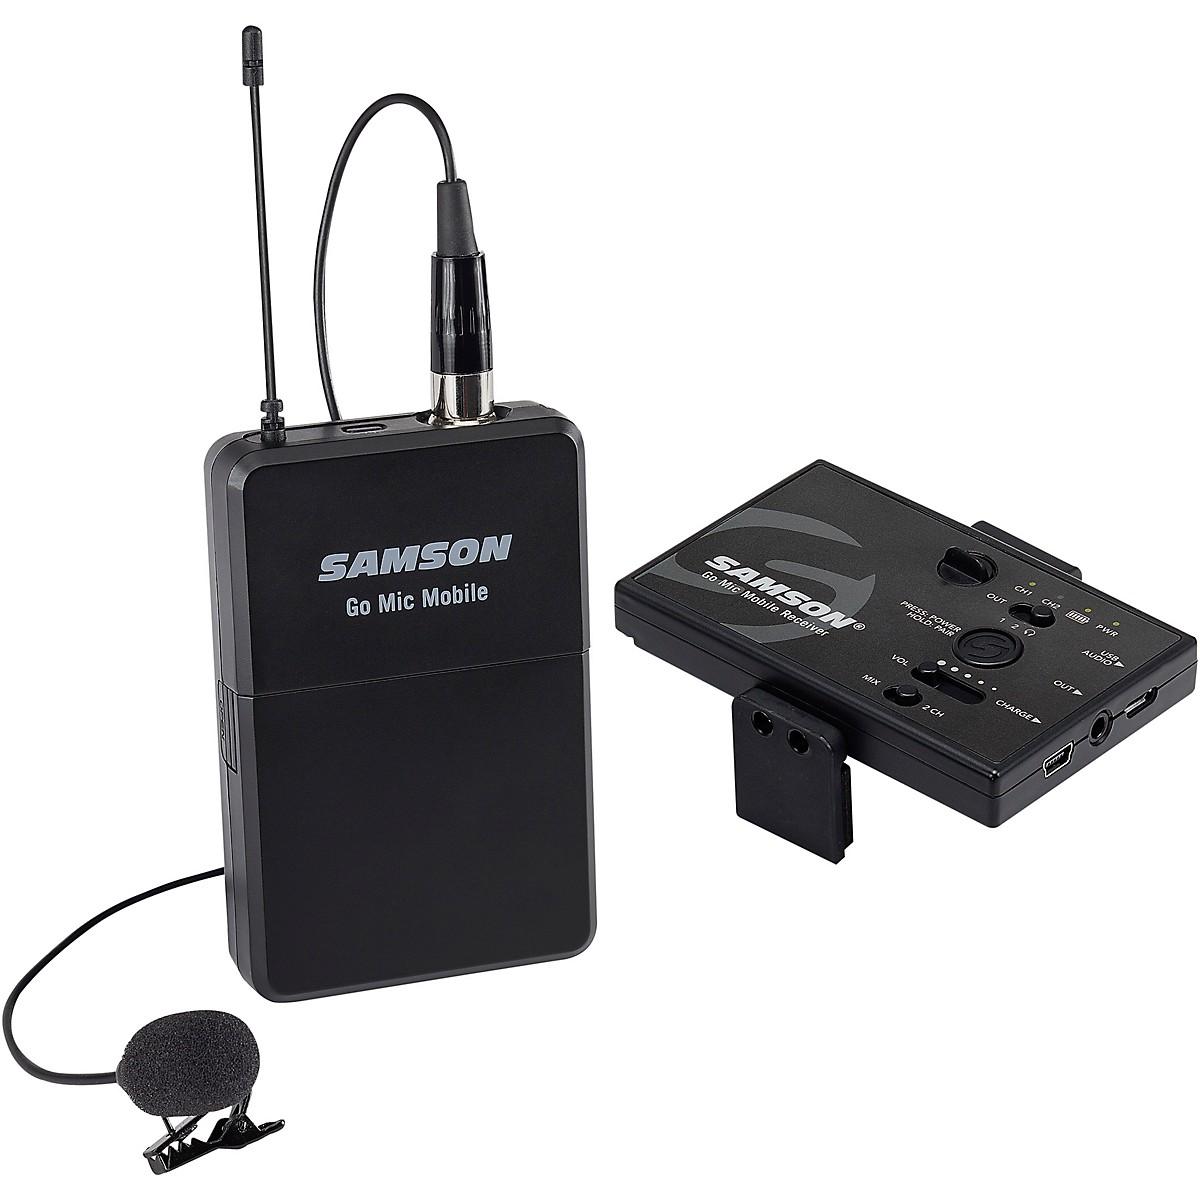 Samson Go Mic Mobile Digital Lavalier Wireless Sysytem LM8 Microphone